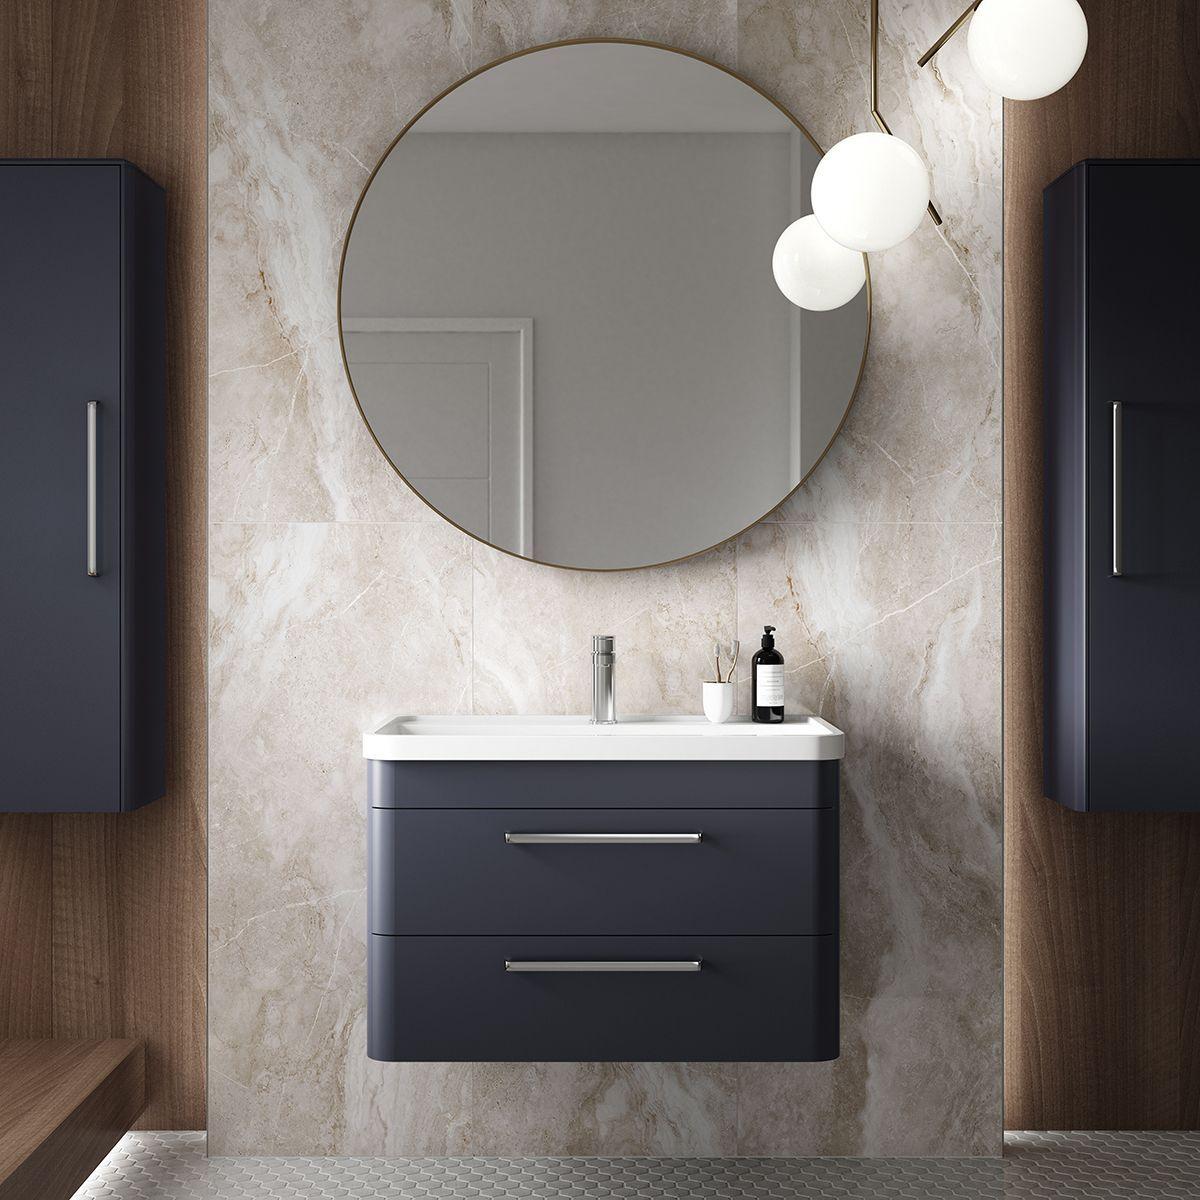 The Modern Hudson Reed Solar Range Of Bathroom Furniture Is Something Special Extra Modern Feat Fitted Bathroom Furniture Basin Vanity Unit Bathroom Furniture